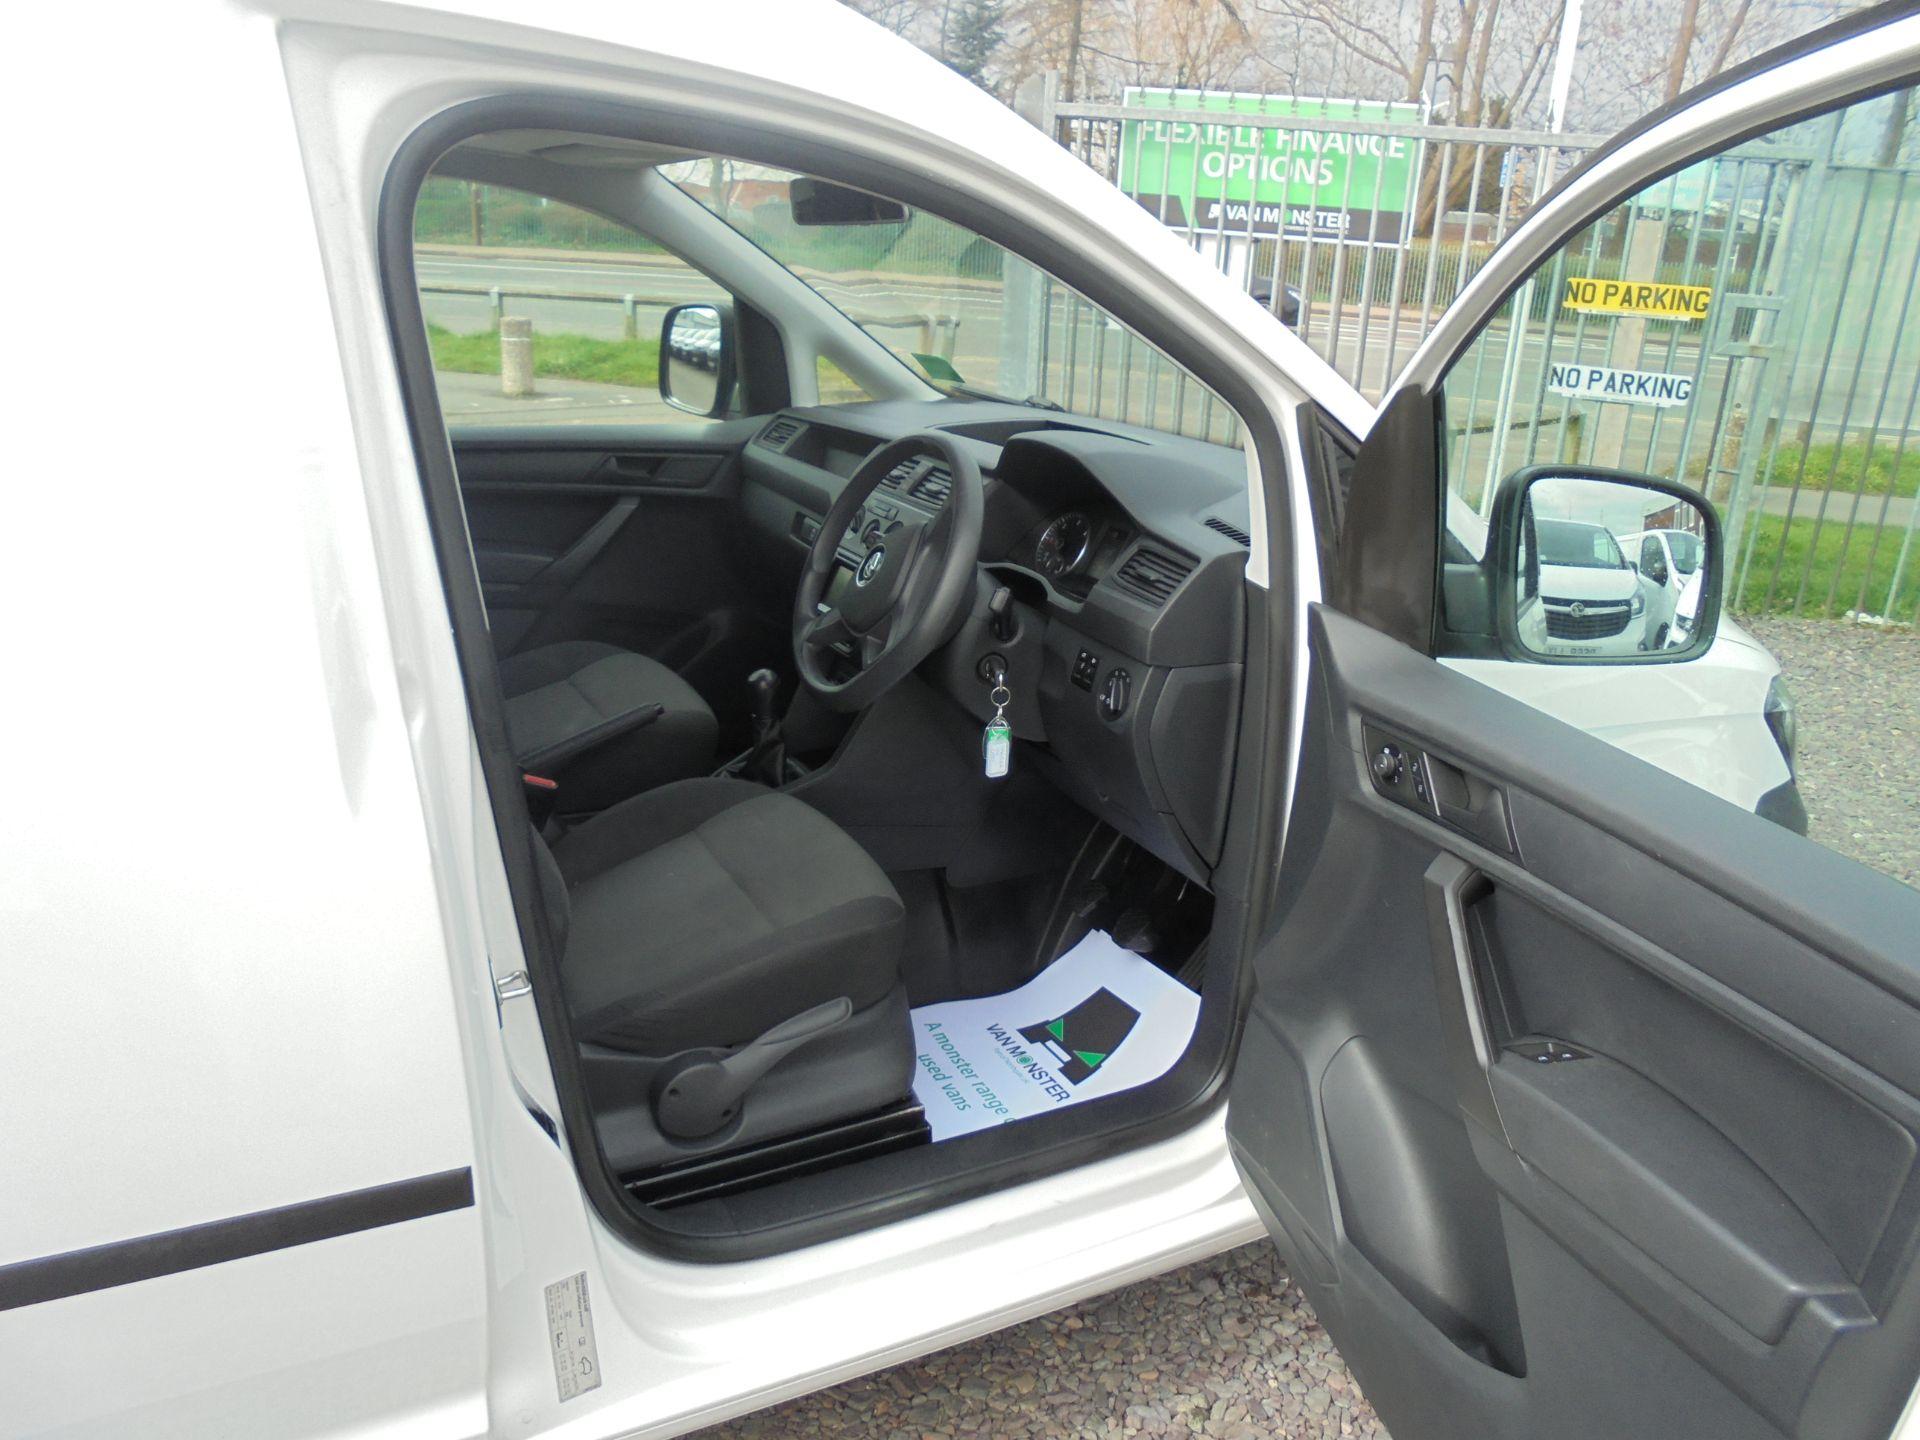 2016 Volkswagen Caddy 1.6 TDI BLUEMOTION TECH 75PS EURO 5 (GF66BZK) Image 11